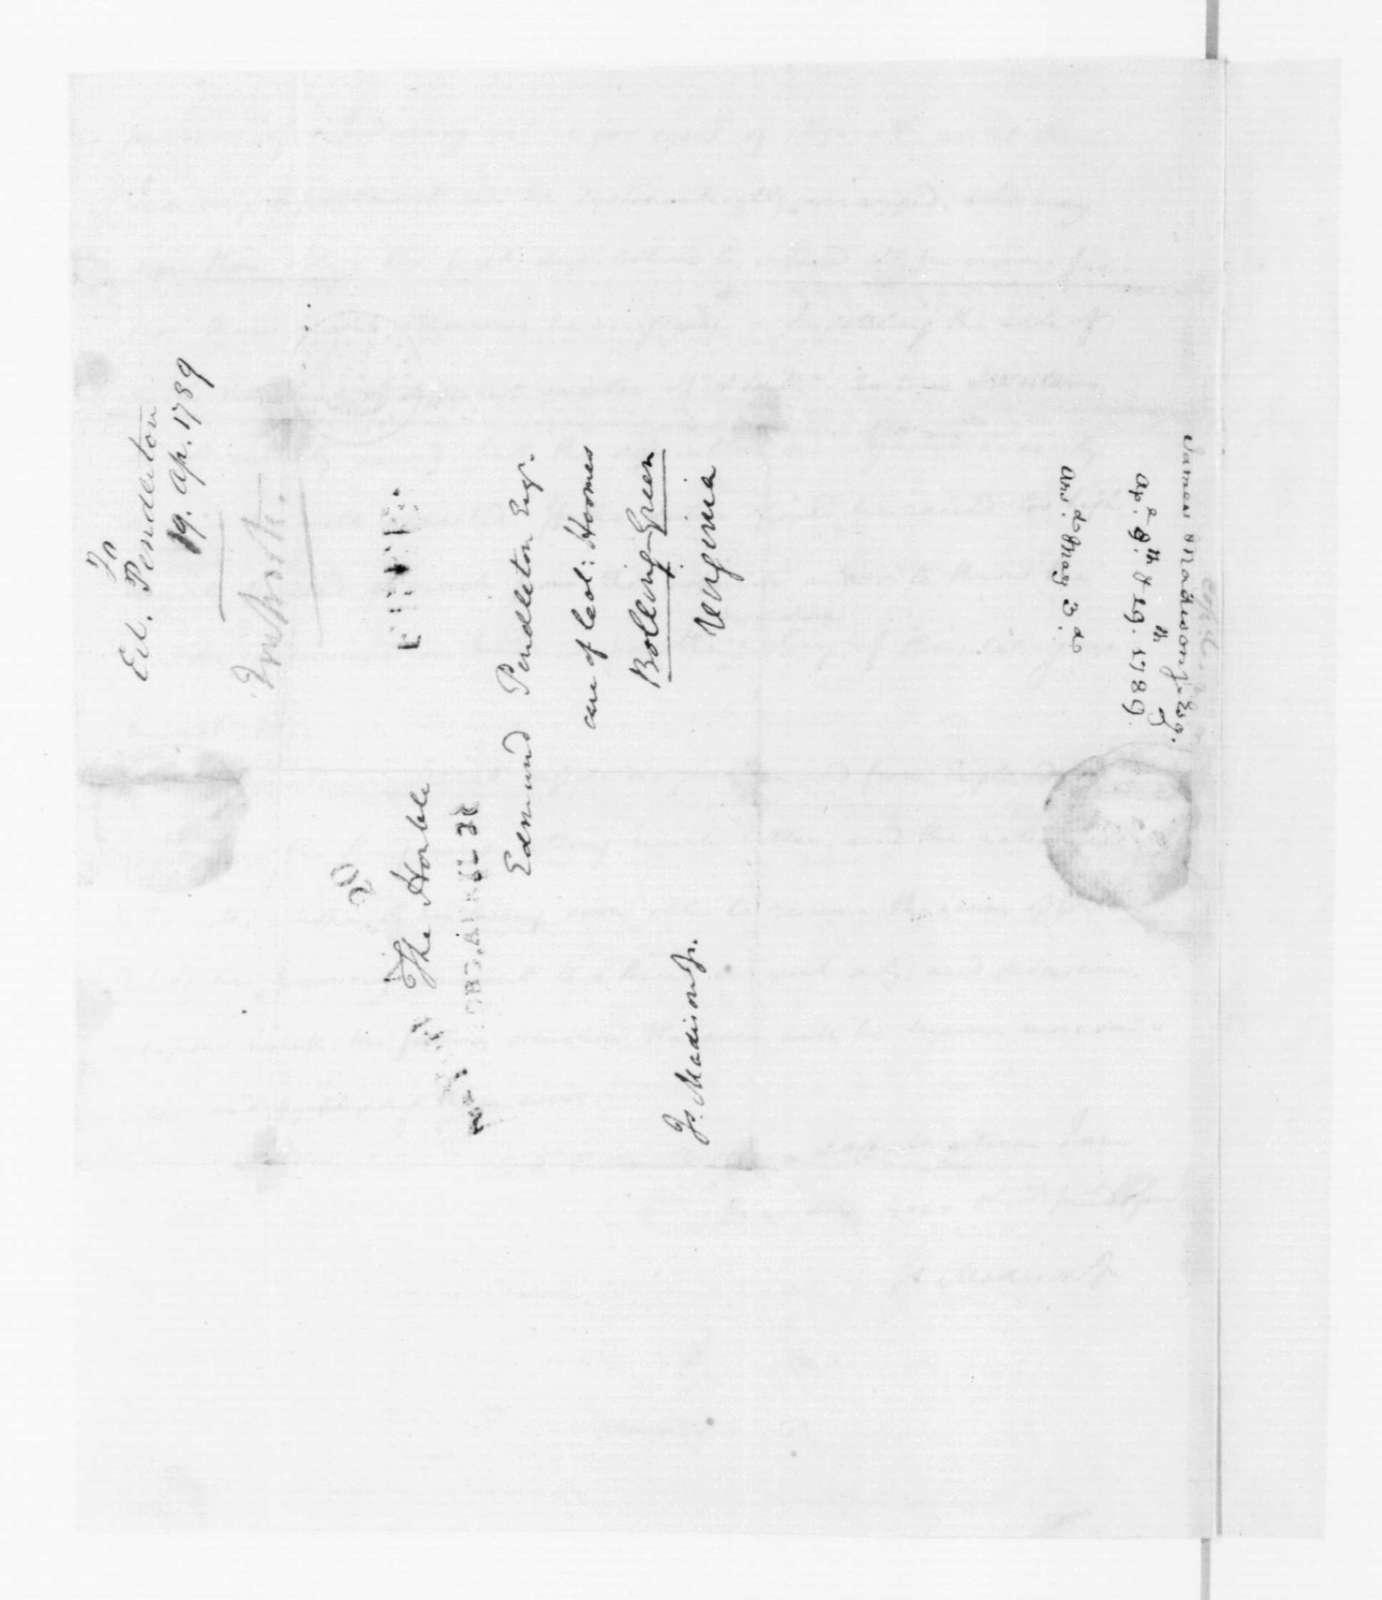 James Madison to Edmund Pendleton, April 21, 1789.